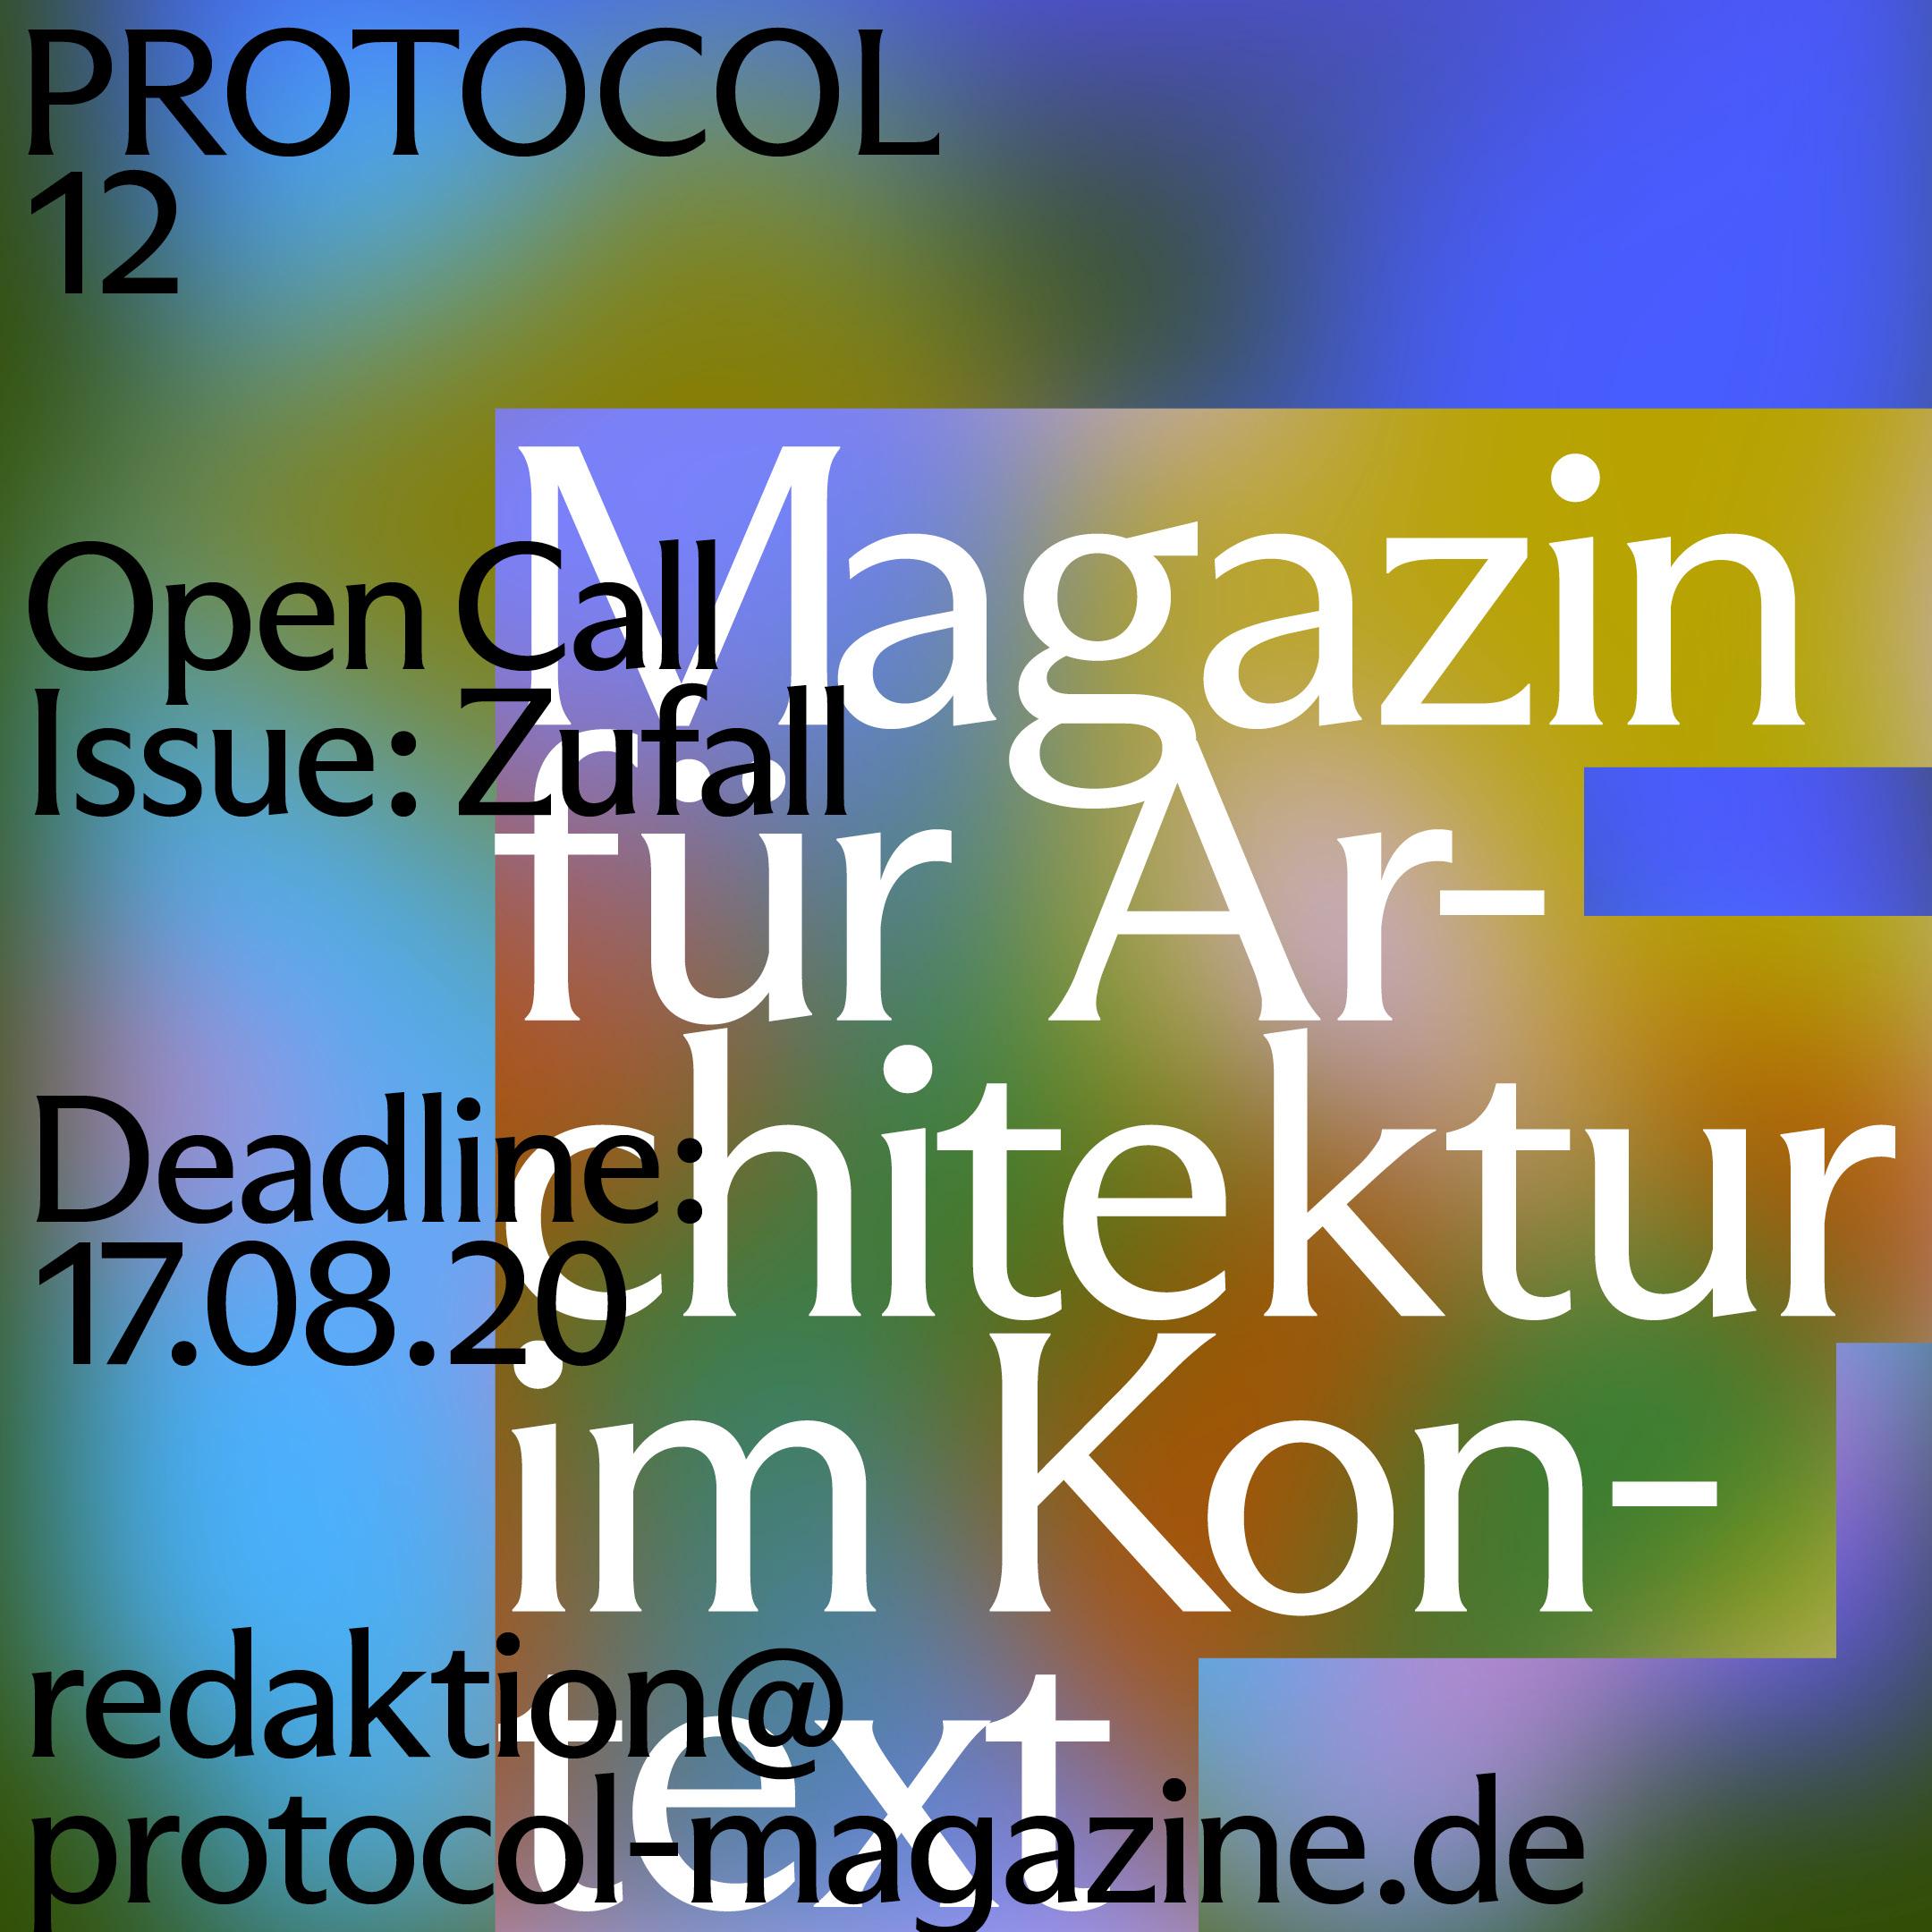 p12_Instagram-Redaktion_Protocol-Magazin_Magazin-fuer-Architektur-im-Kontext26